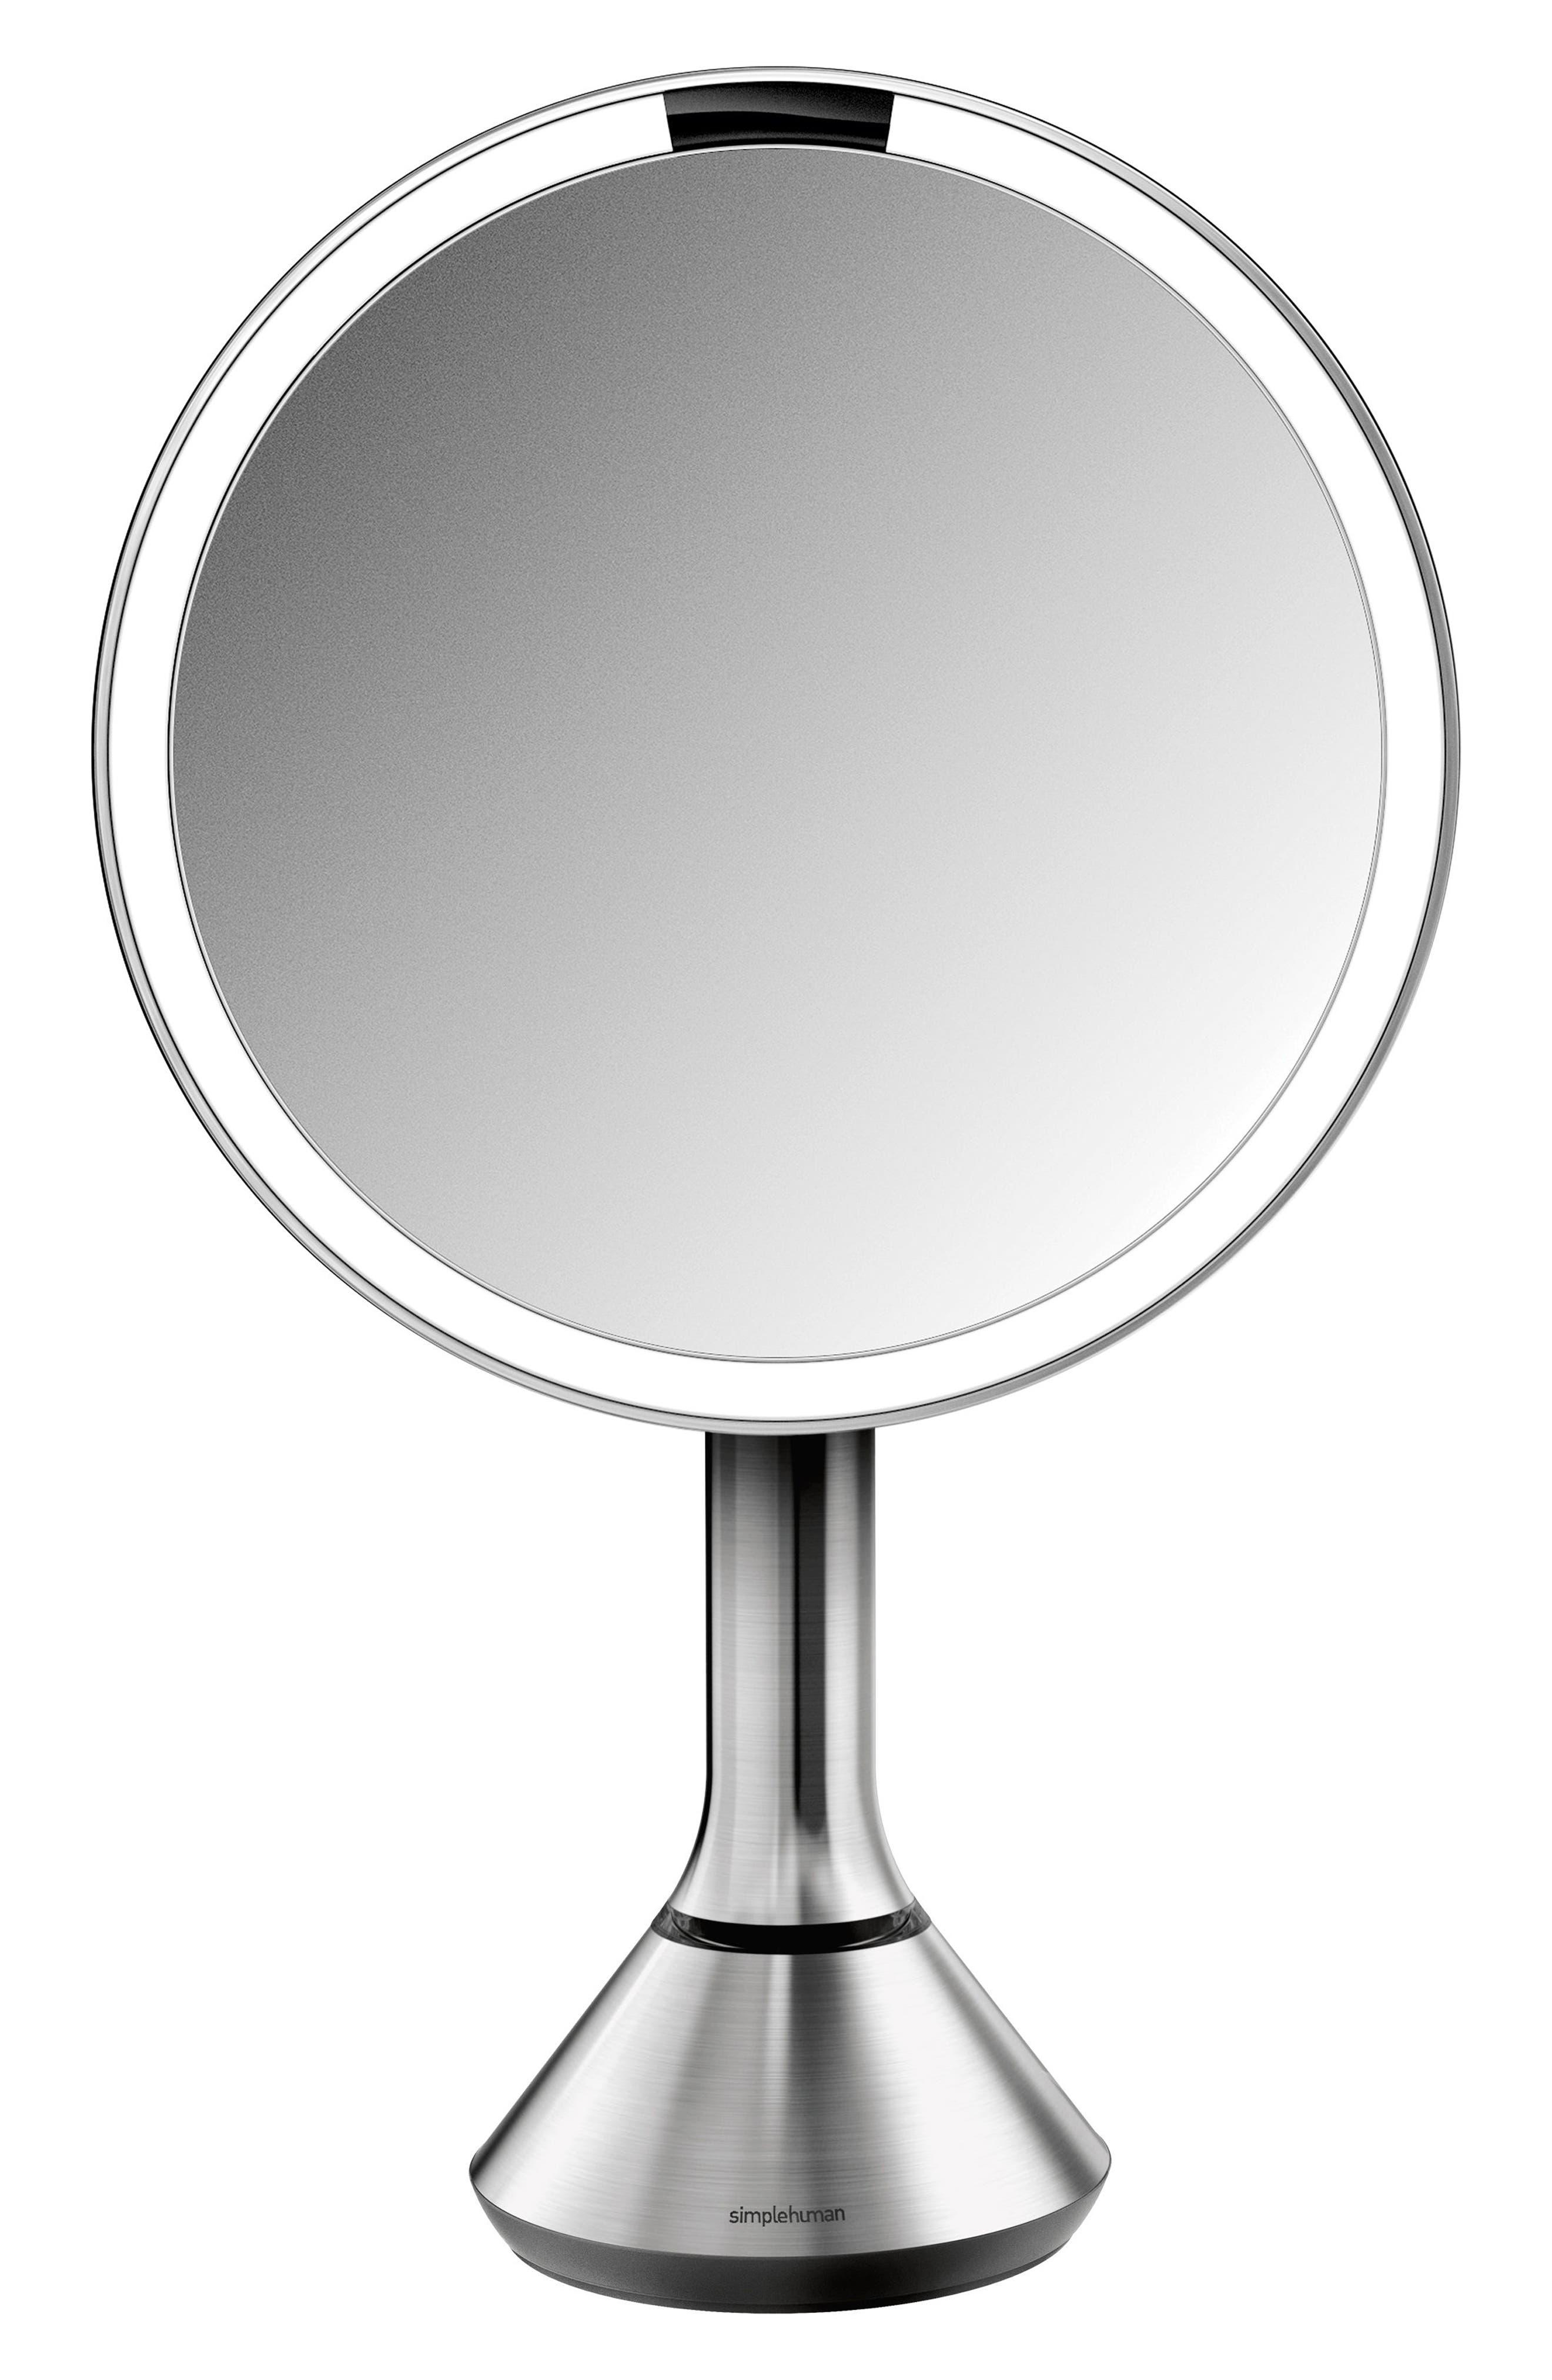 Main Image - simplehuman Eight Inch Sensor Mirror with Brightness Control